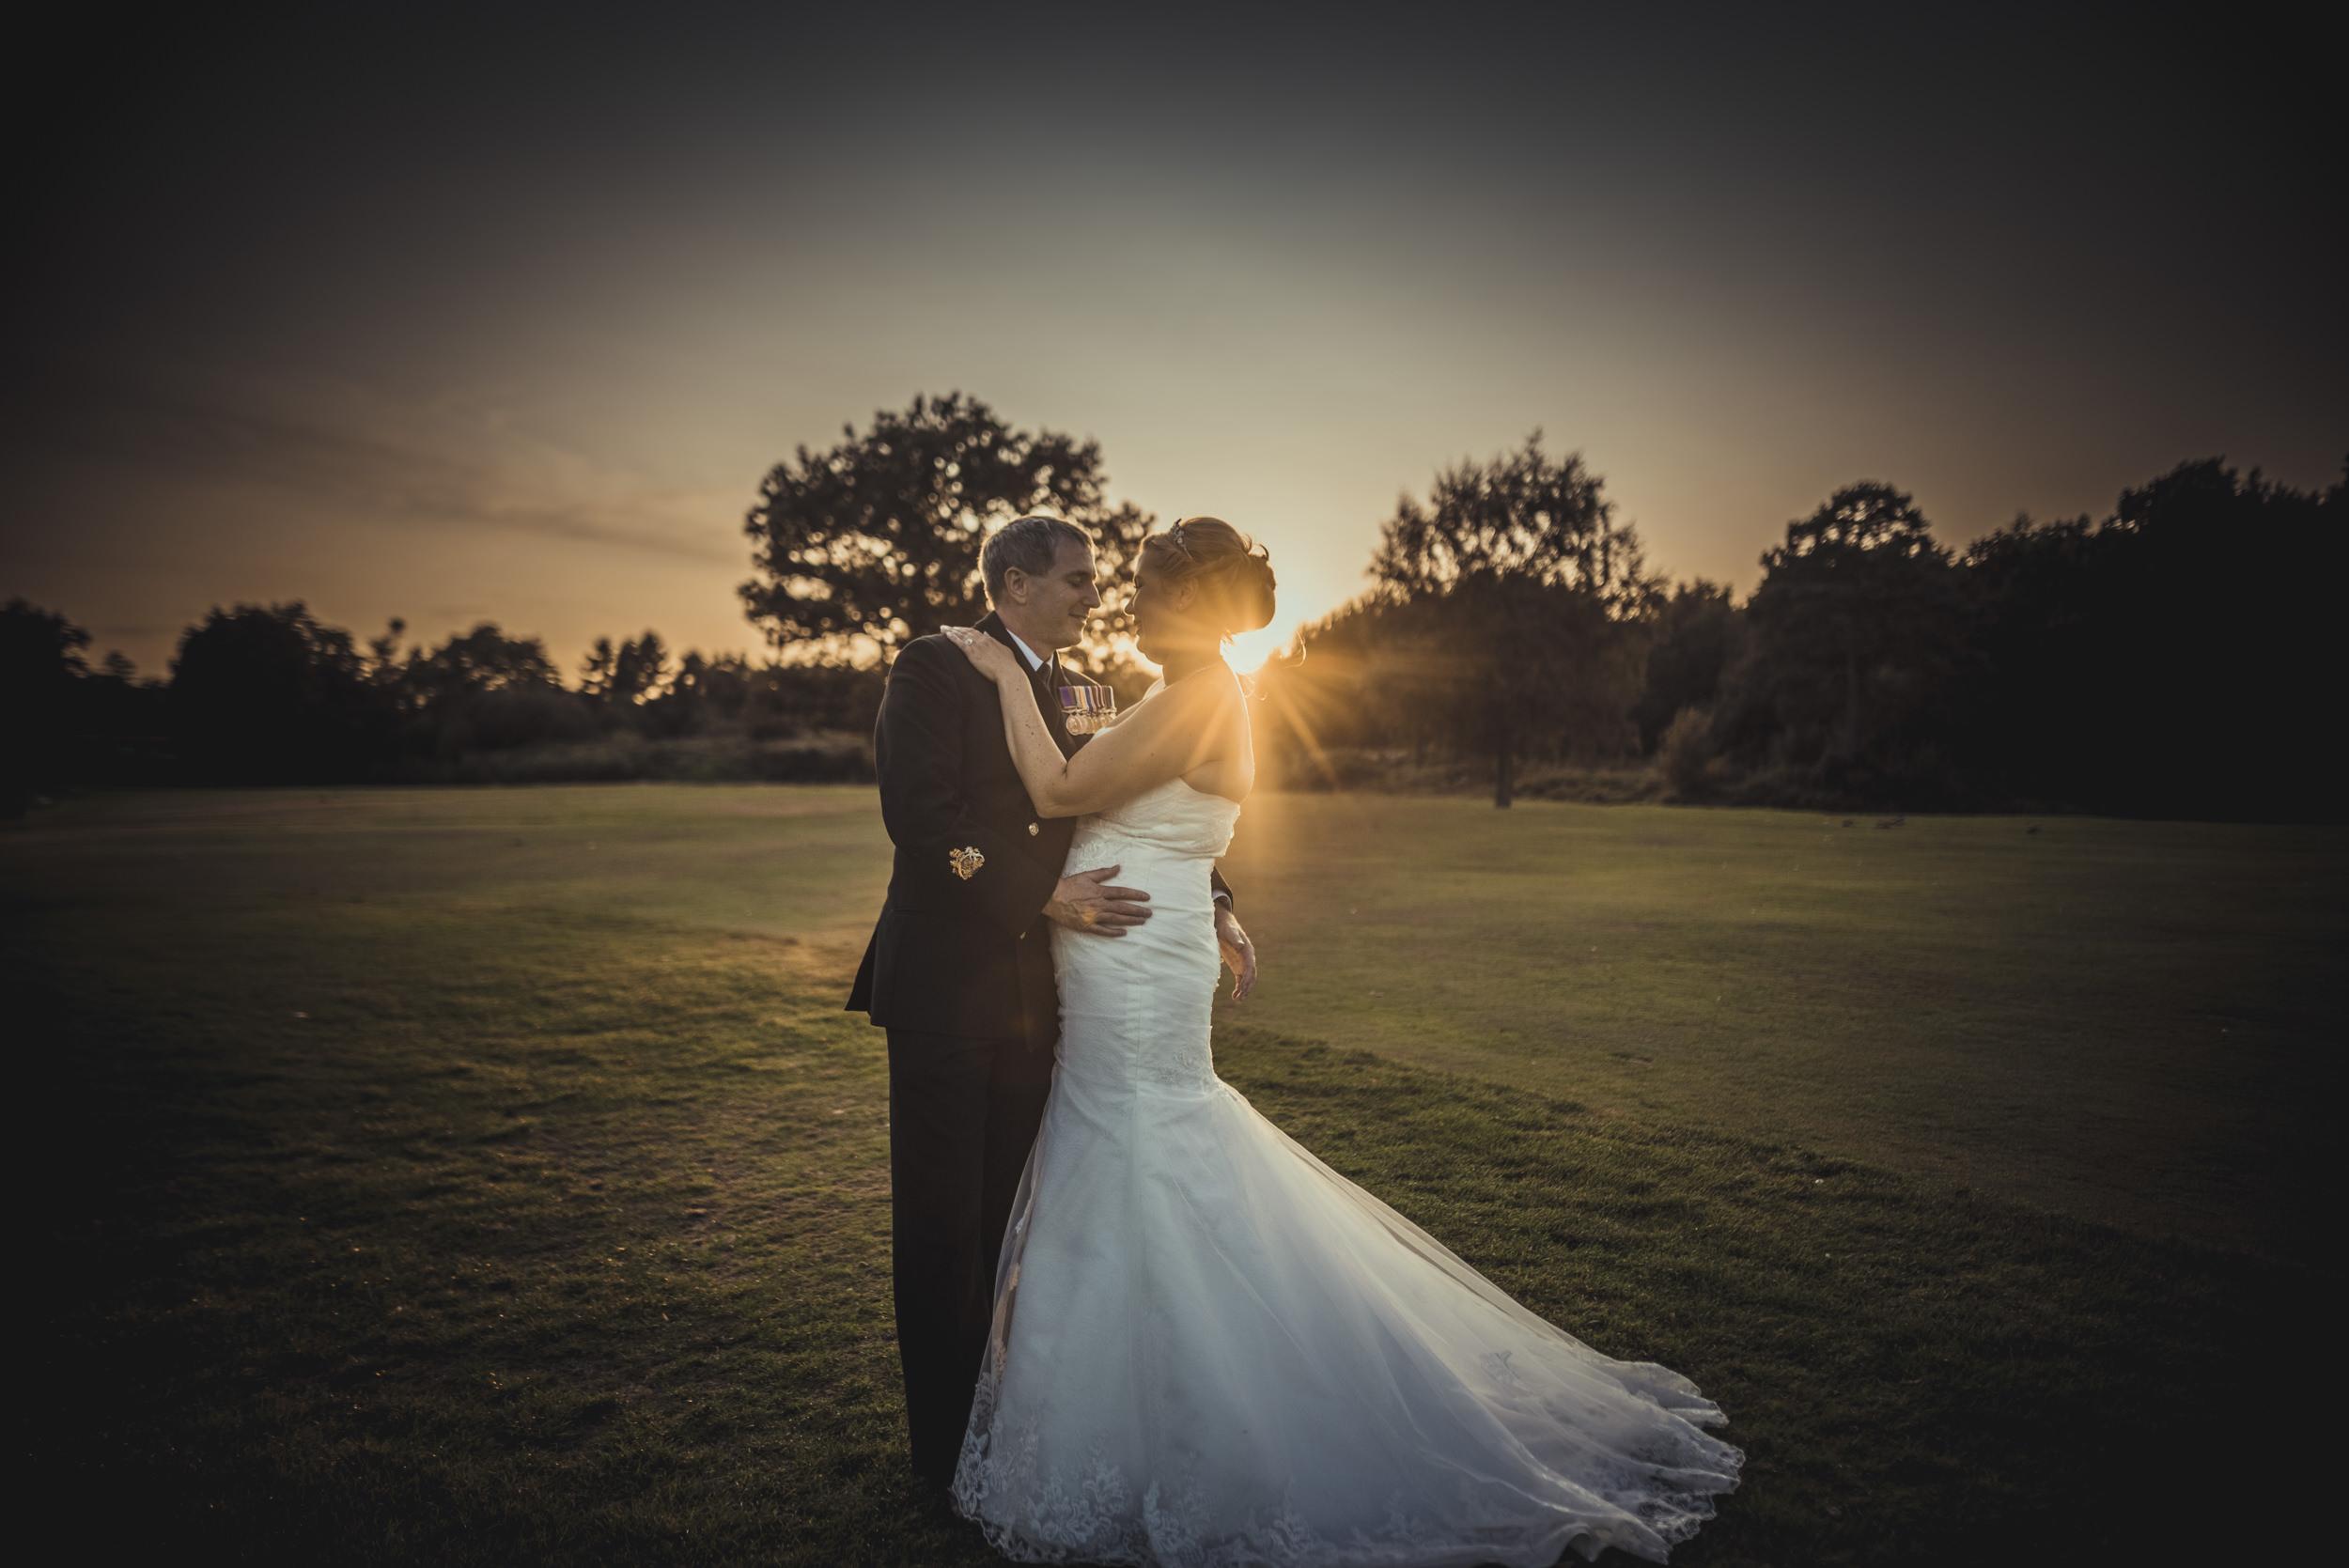 Chantelle-and-Stephen-Old-Thorns-Hotel-Wedding-Liphook-Manu-Mendoza-Wedding-Photography-498.jpg